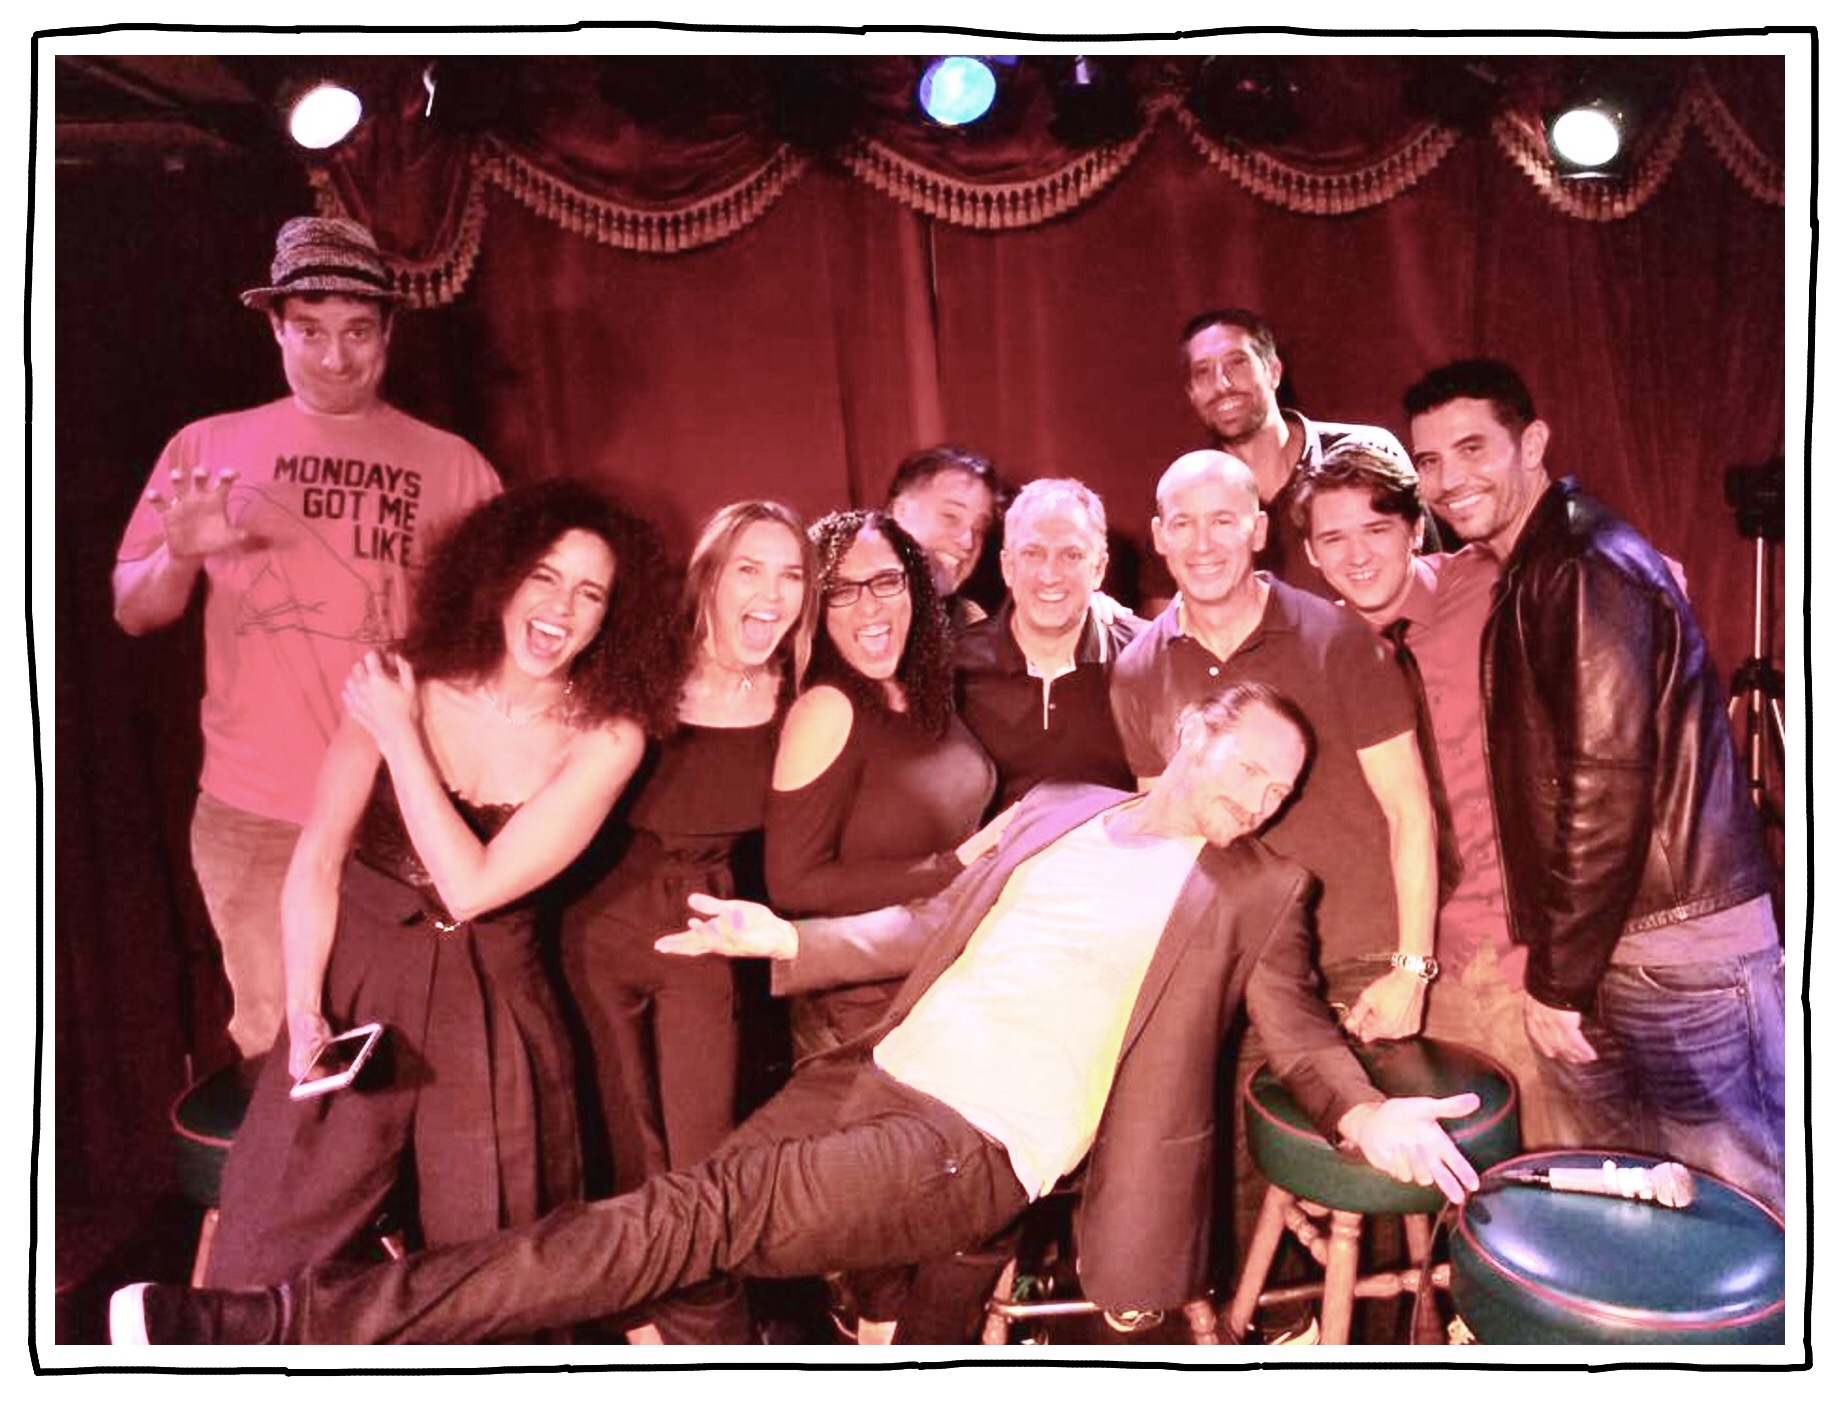 The cast/crew of Midnight, Texas 2018 (Joe far left)